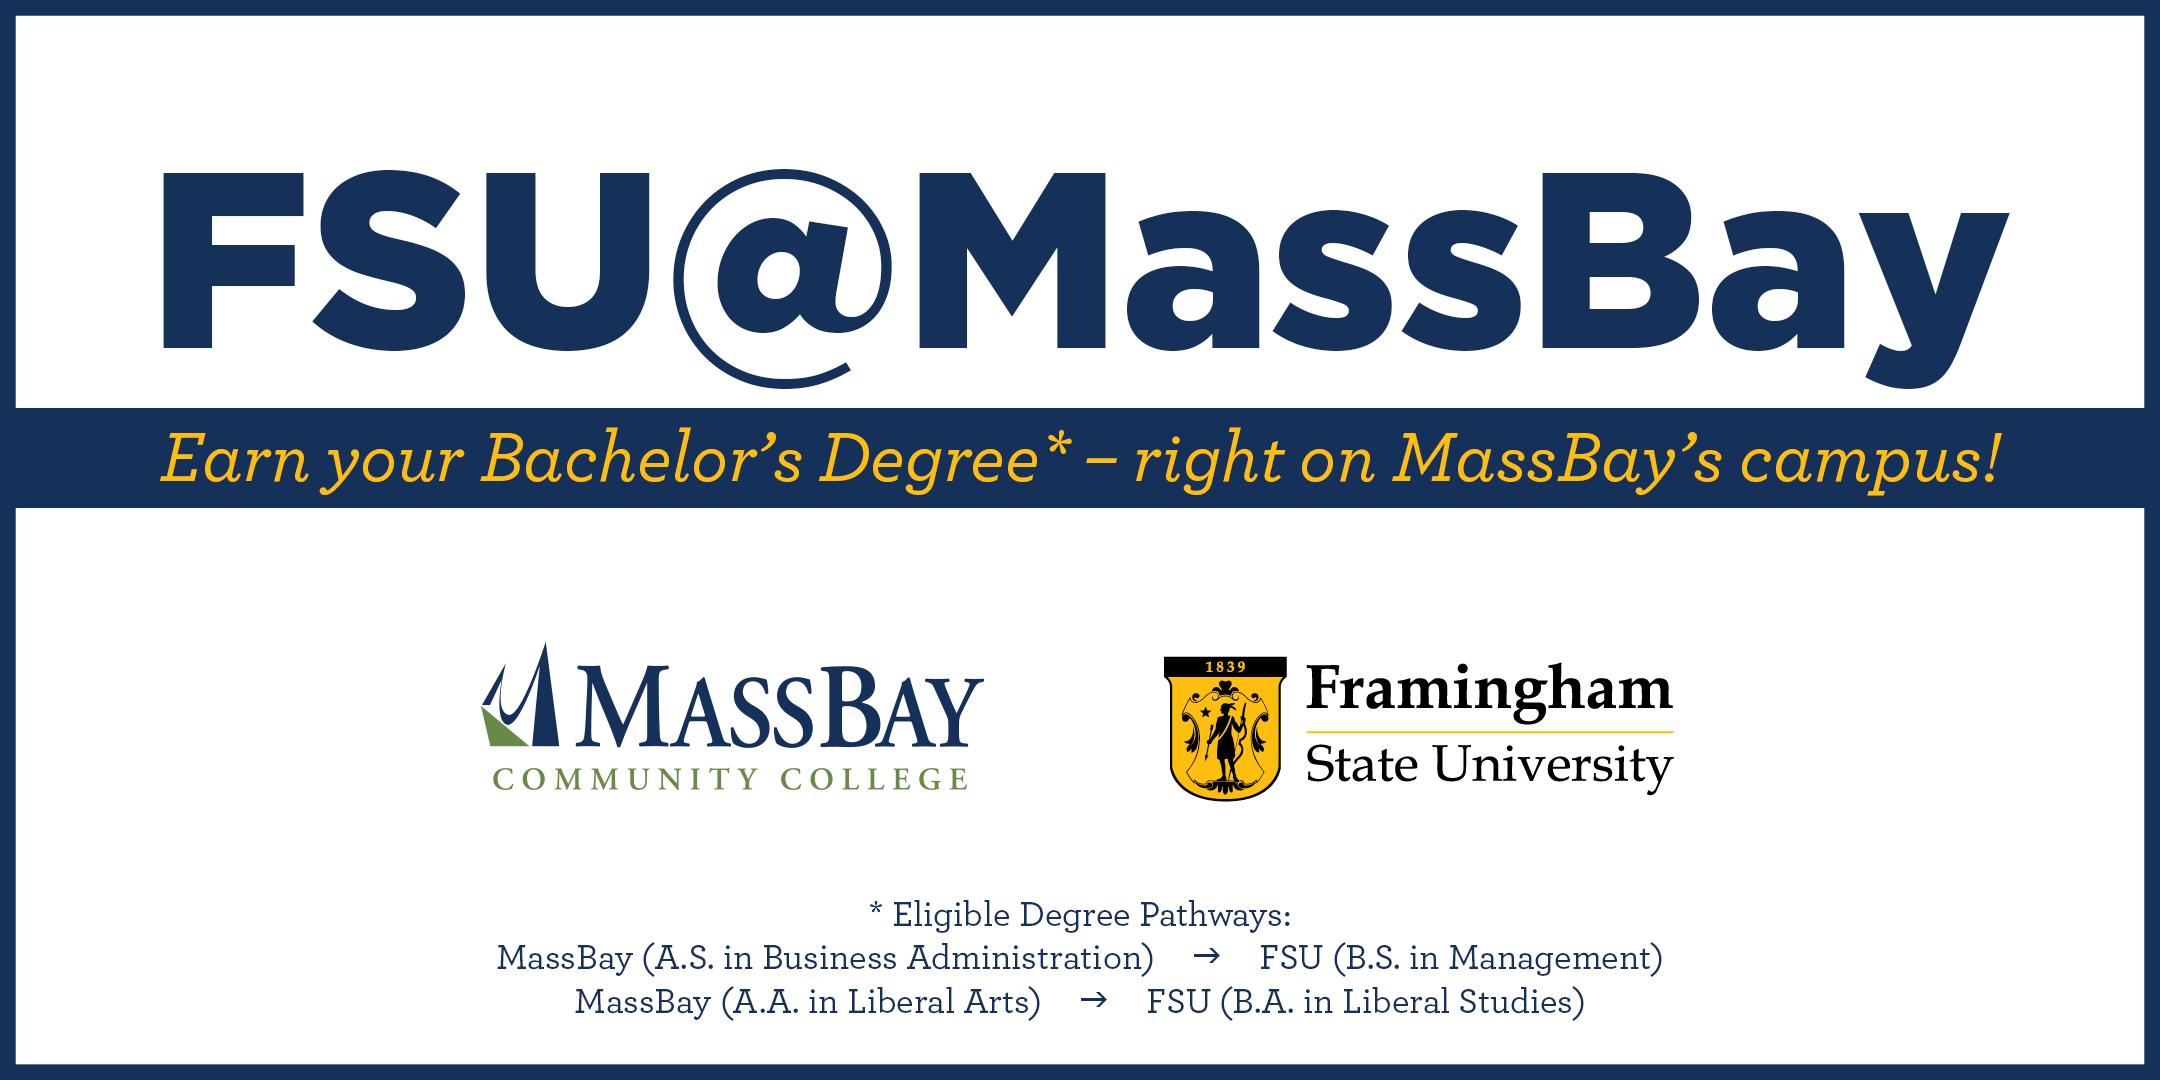 fsu massbay information session 10 2017 fsu massbay information session